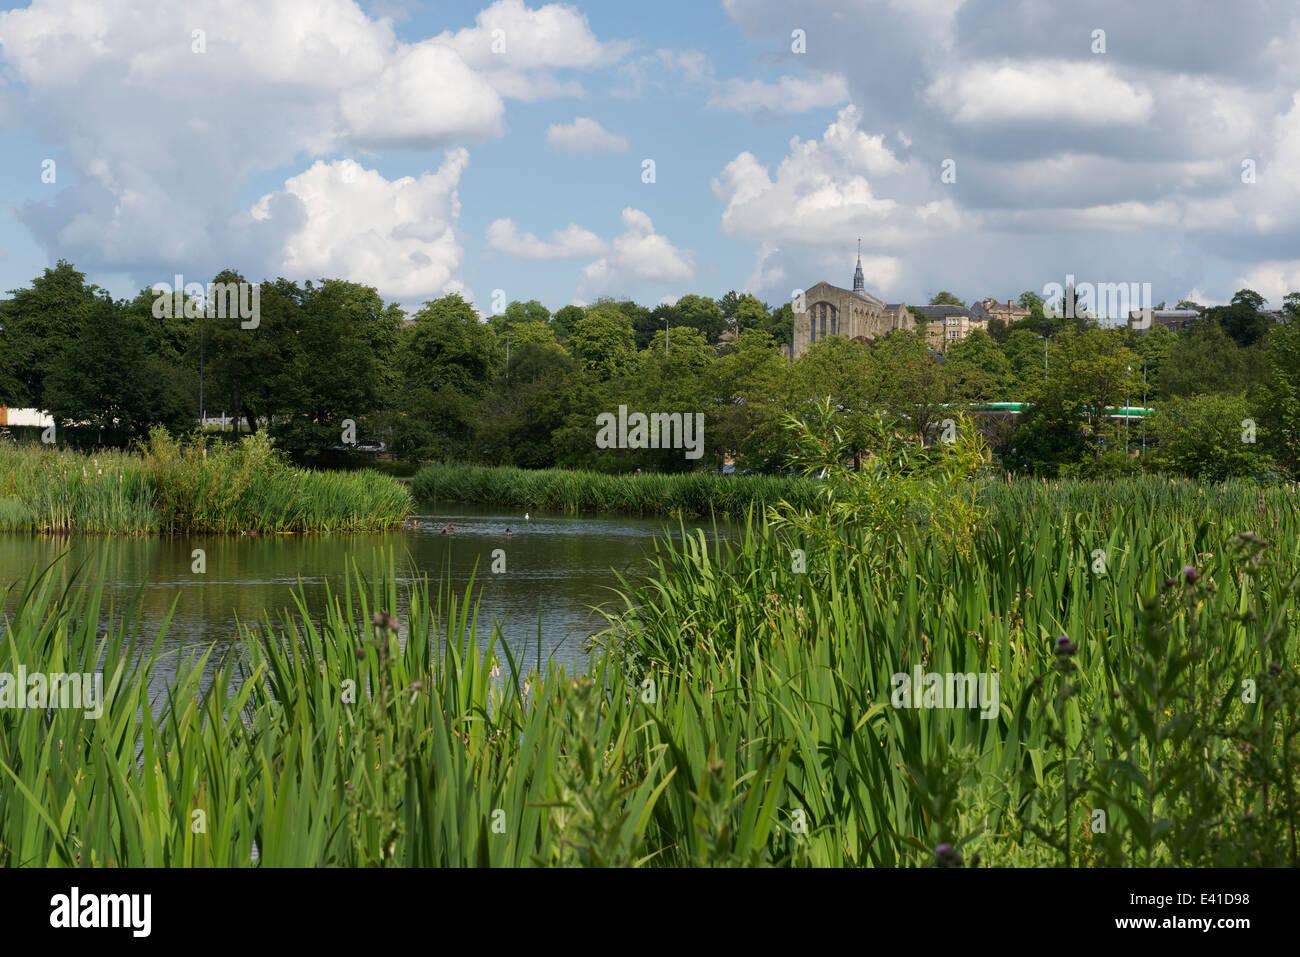 Bingham's Pond, West End, Glasgow. - Stock Image